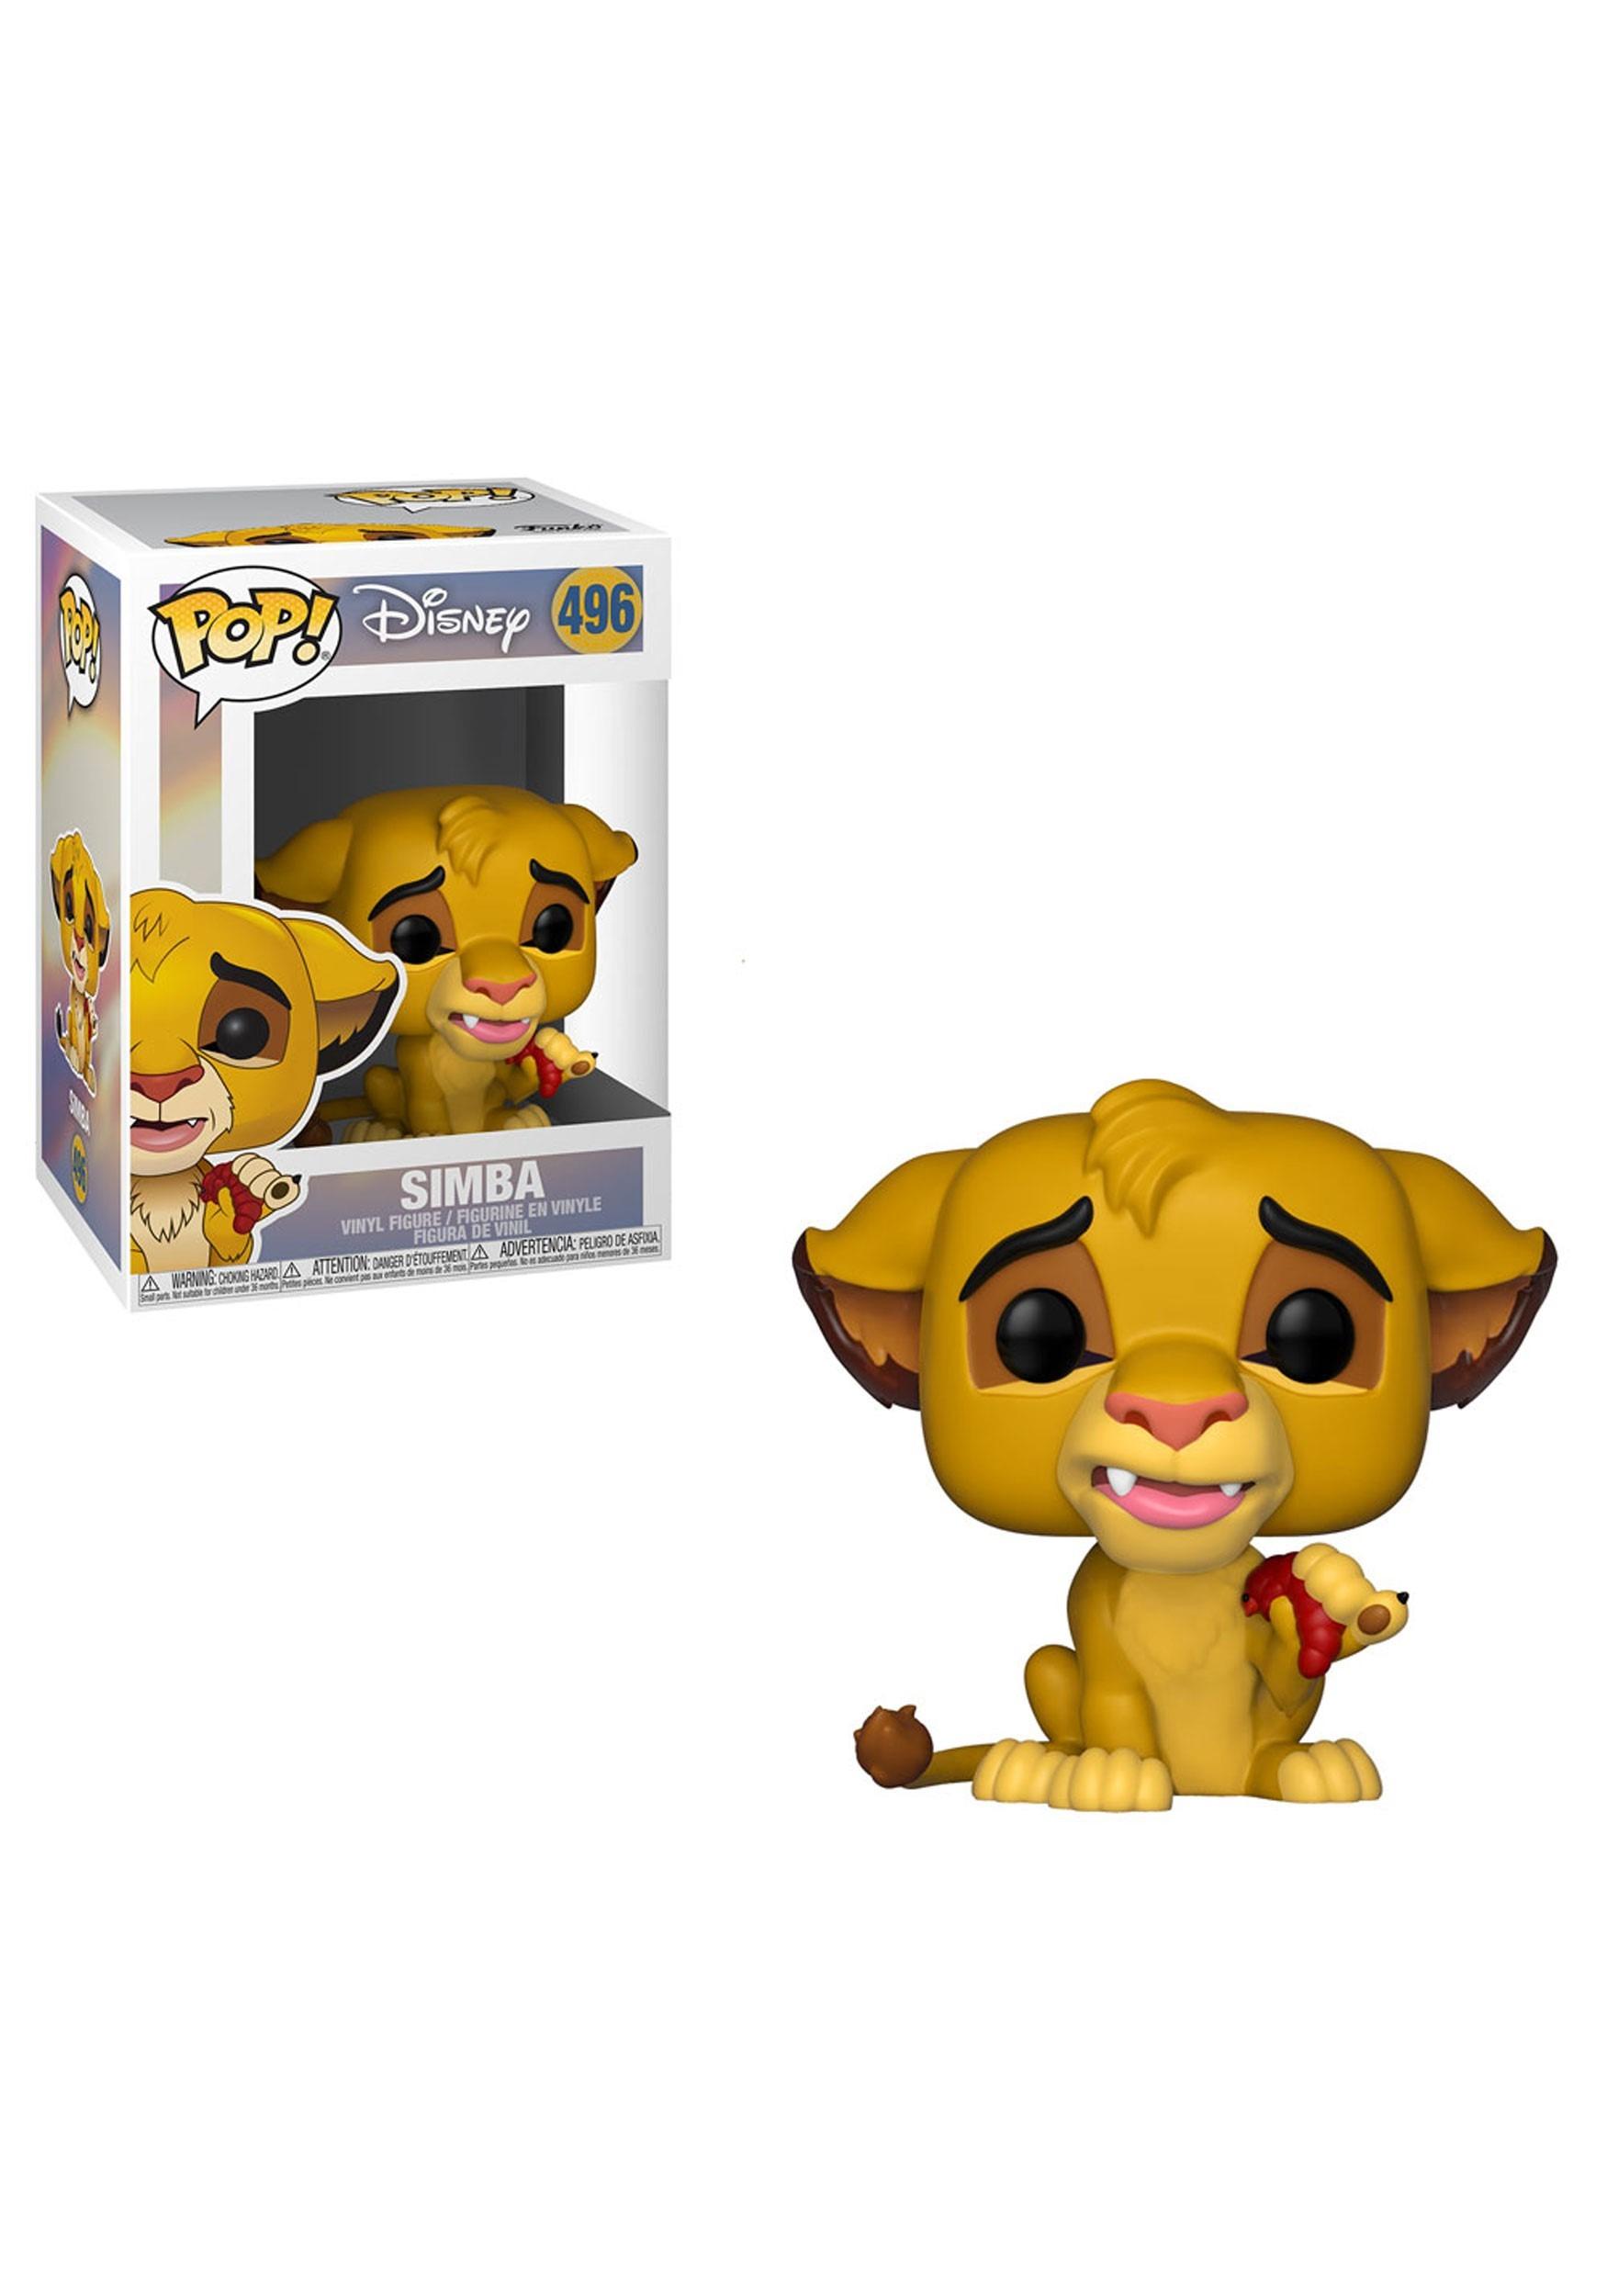 Funko Pop! Disney: Lion King Simba Vinyl Figure